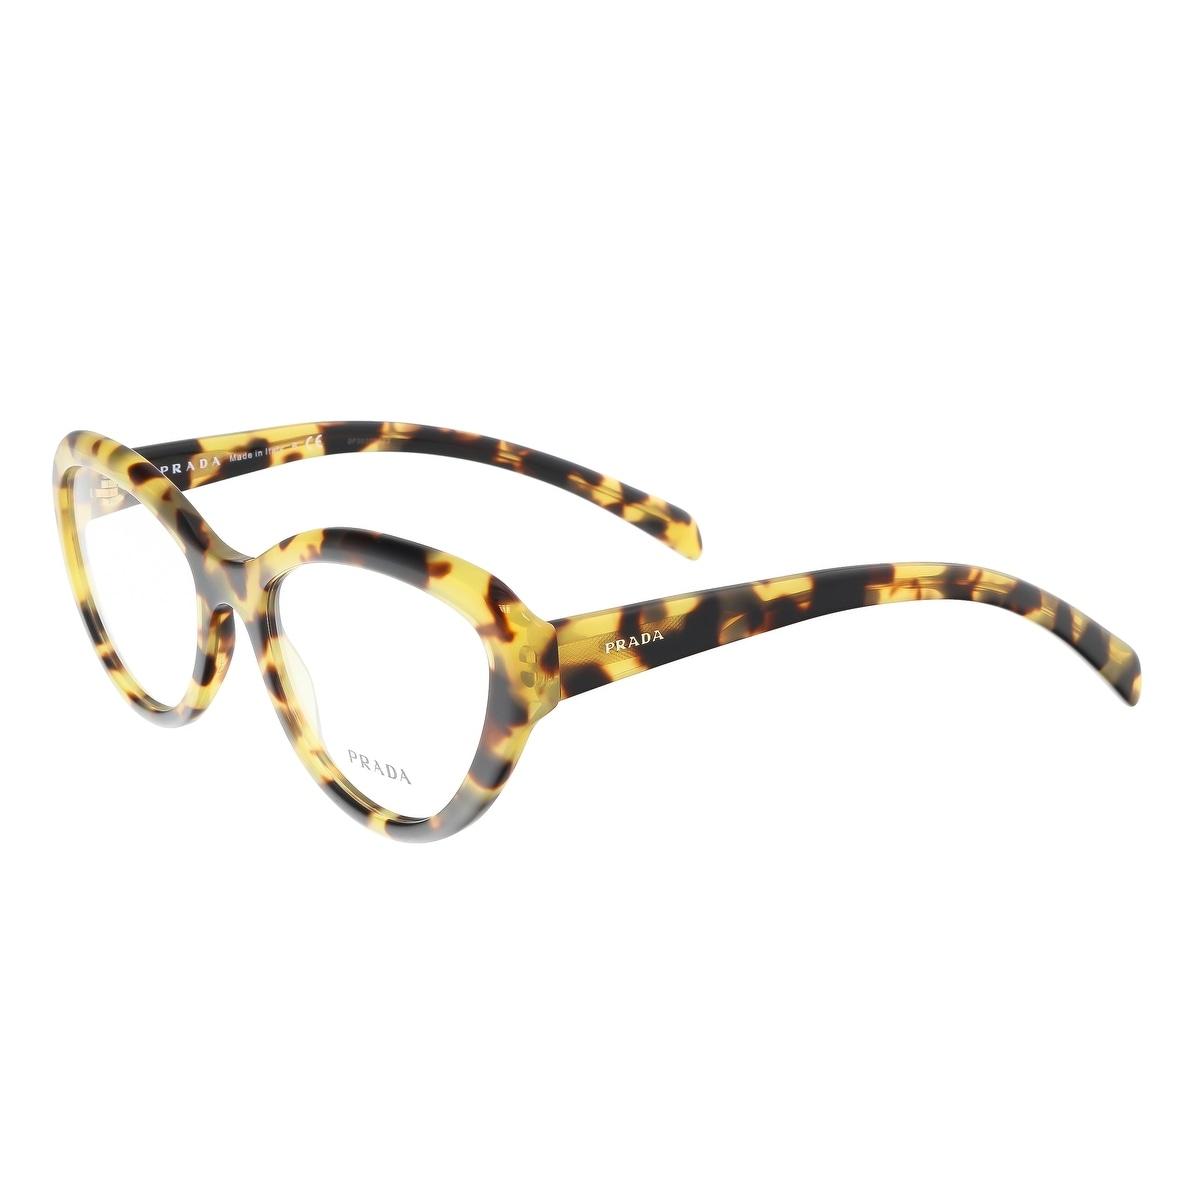 51658897baa Shop Prada PR 25RV 7S01O Tortoise Cateye Journal Optical Frames - 54 ...